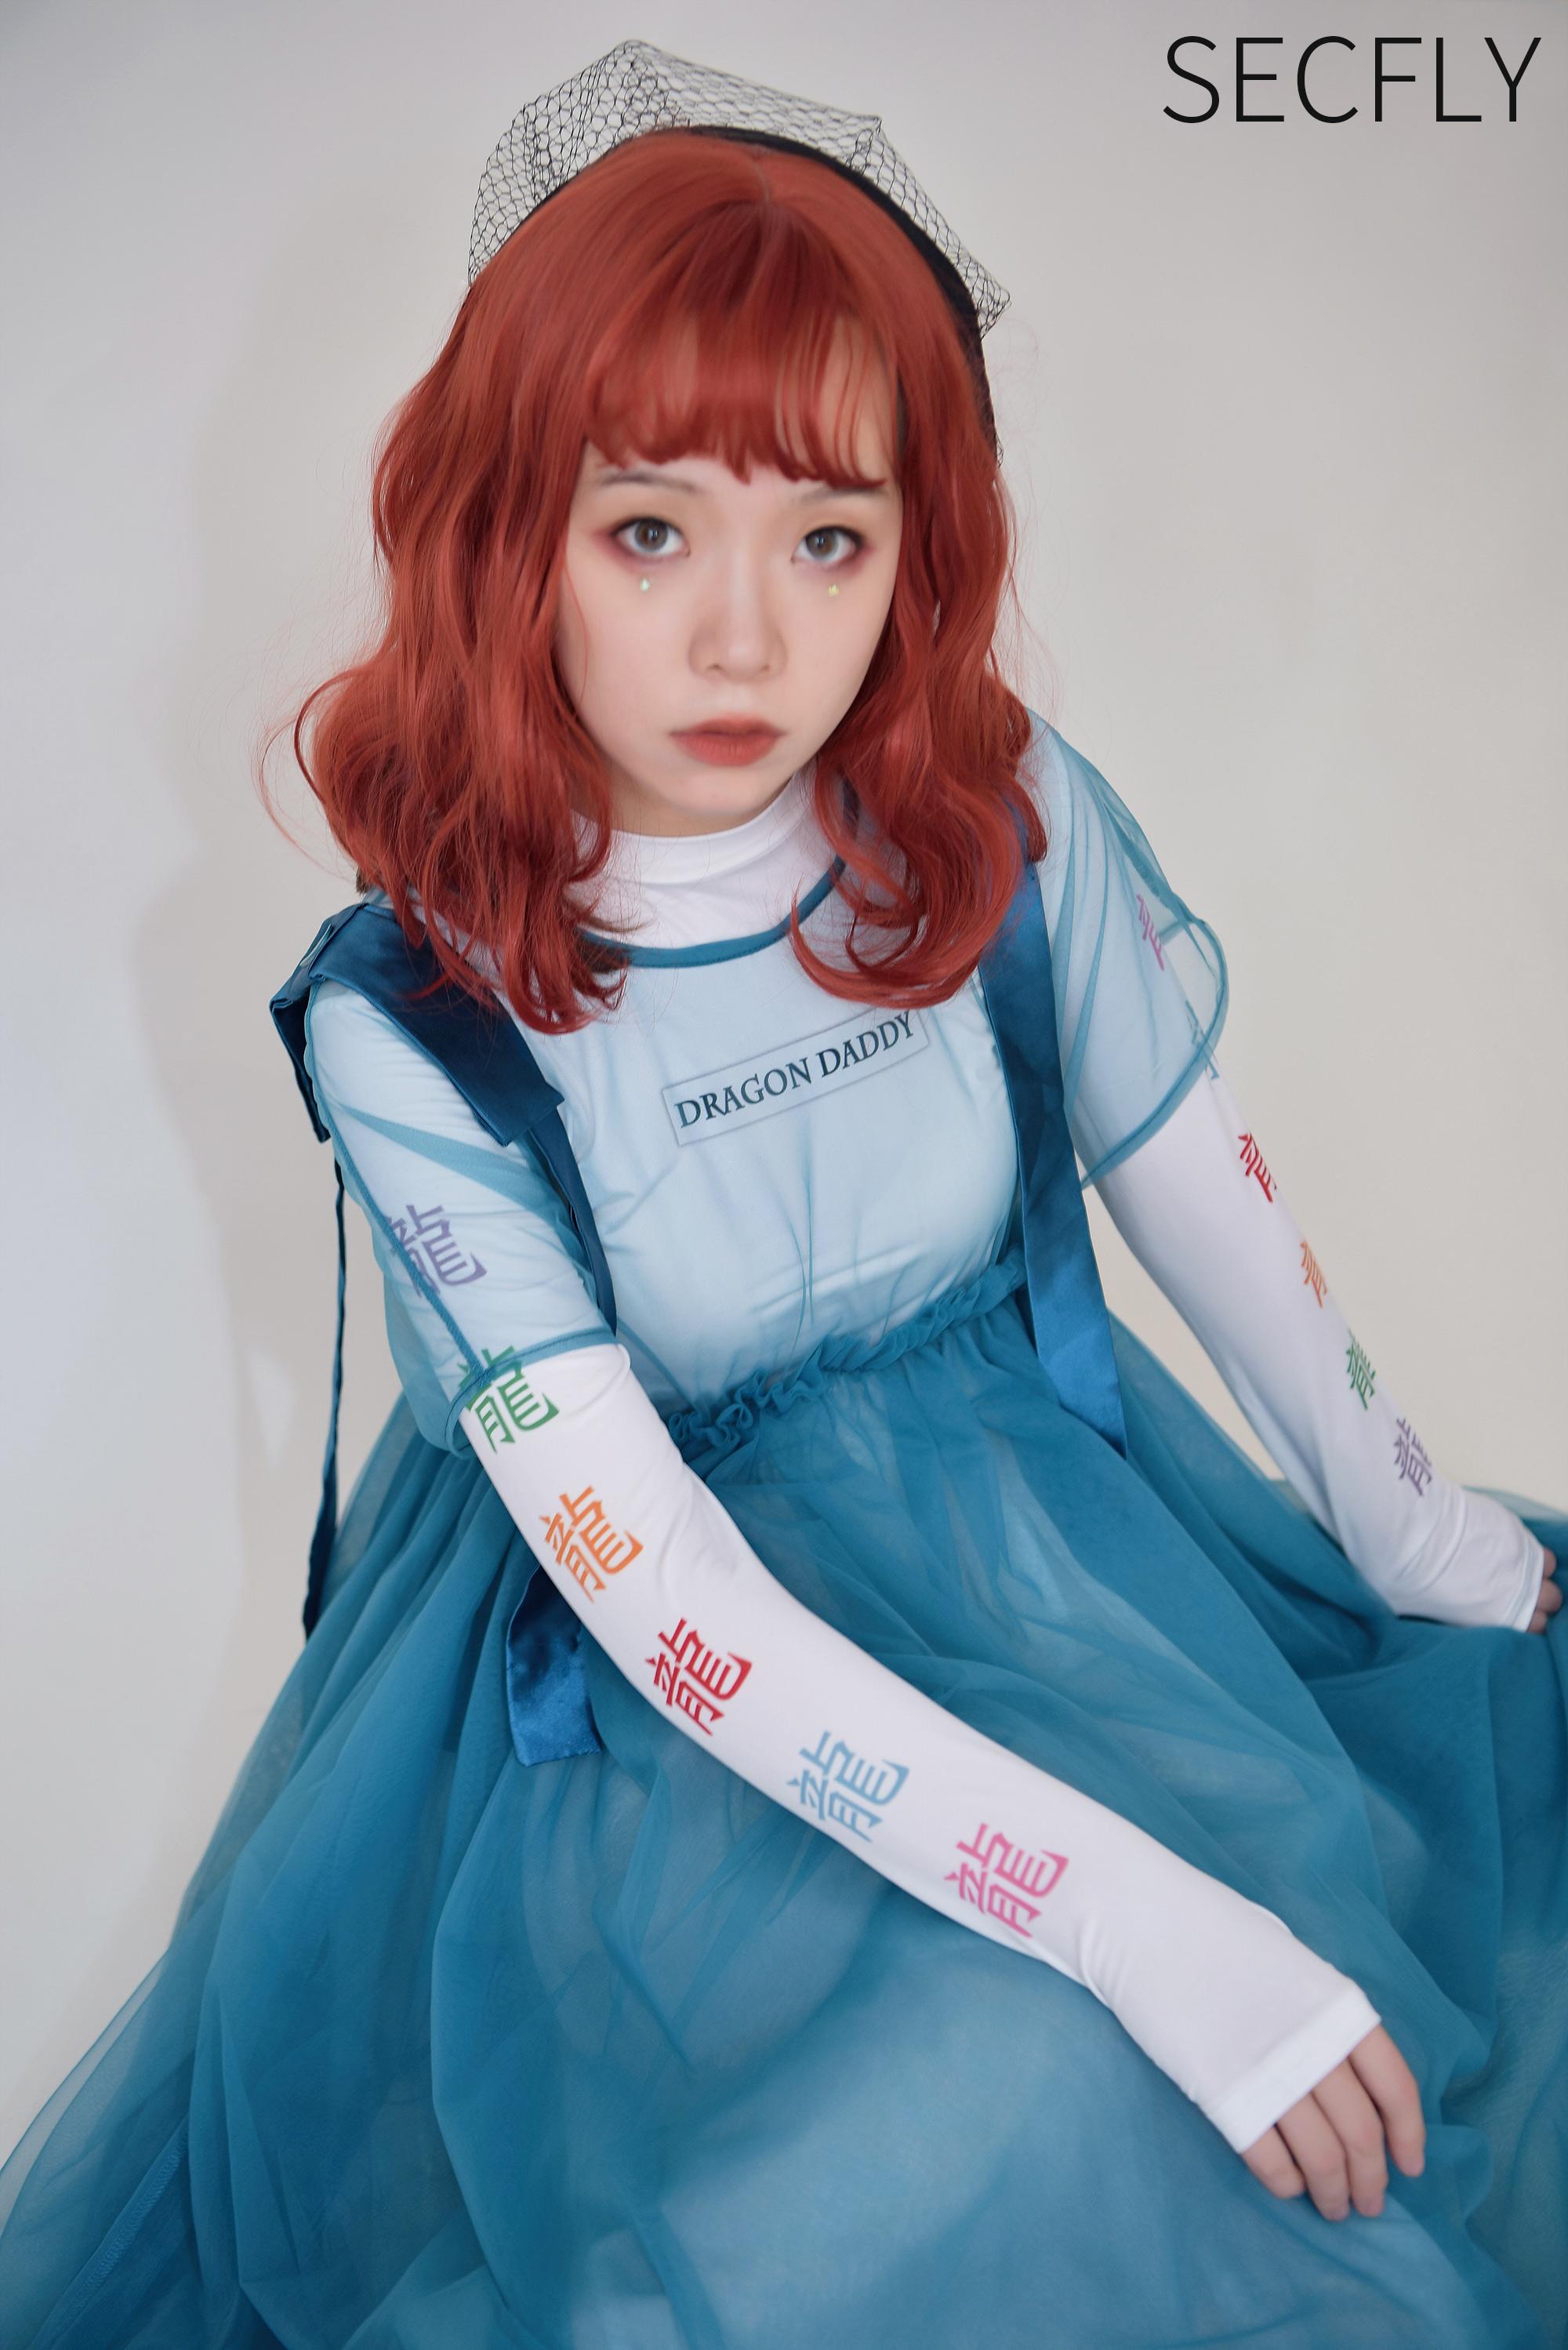 SECFLY【Dragon Daddy】孔雀蓝龙王刺绣卫衣纱裙